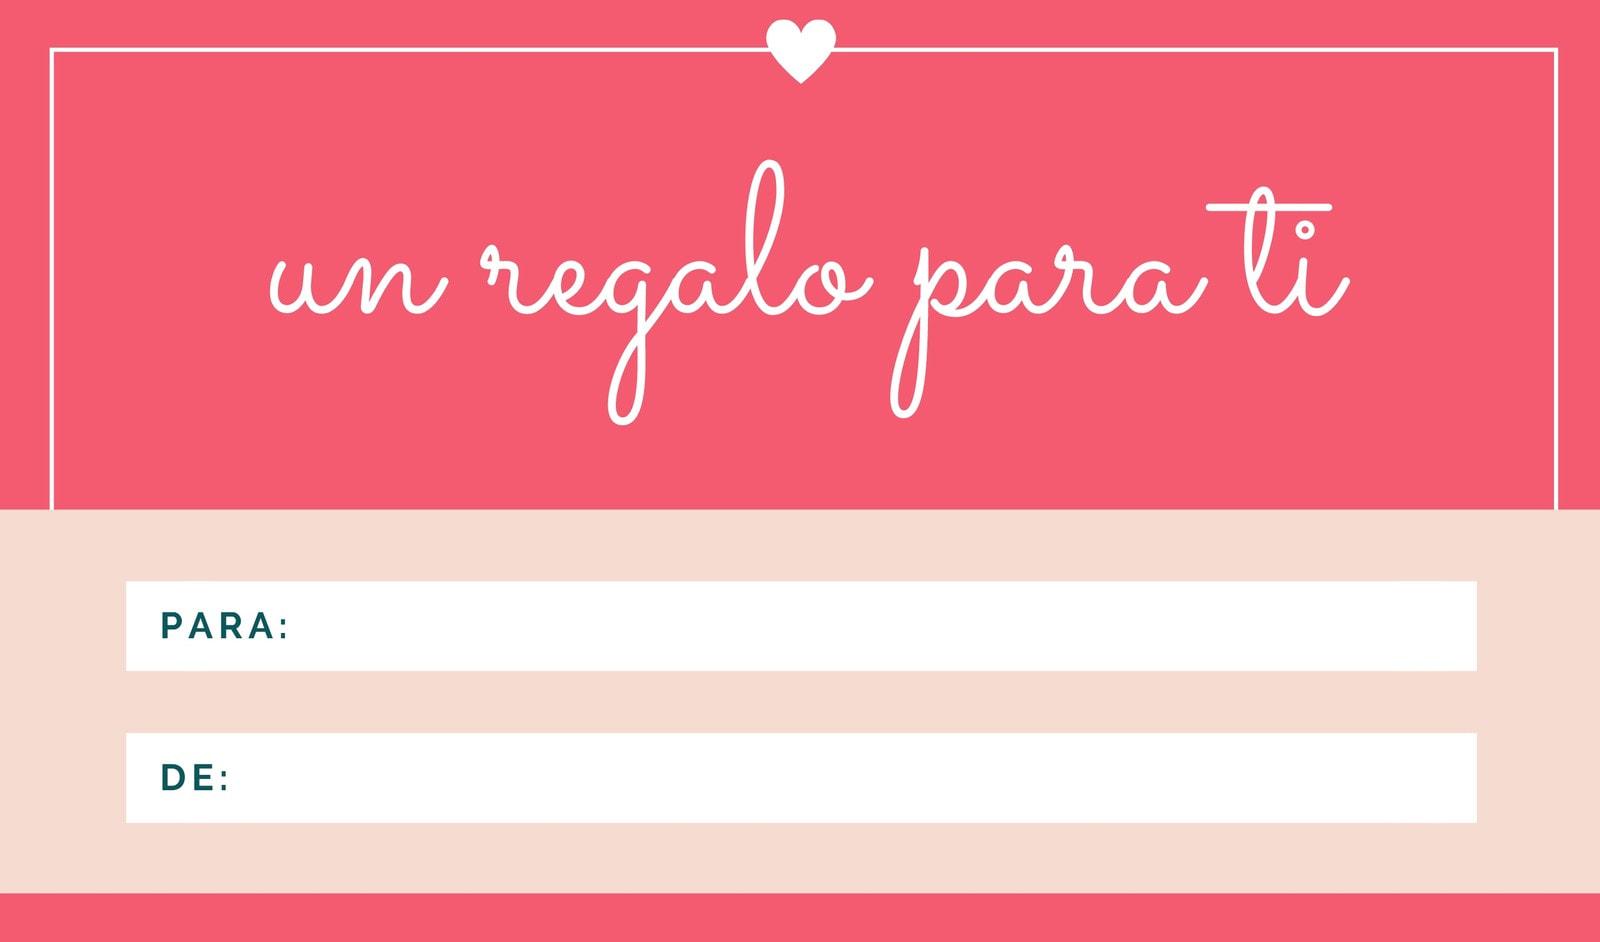 Rosa Borde Corazón Regalo Etiqueta